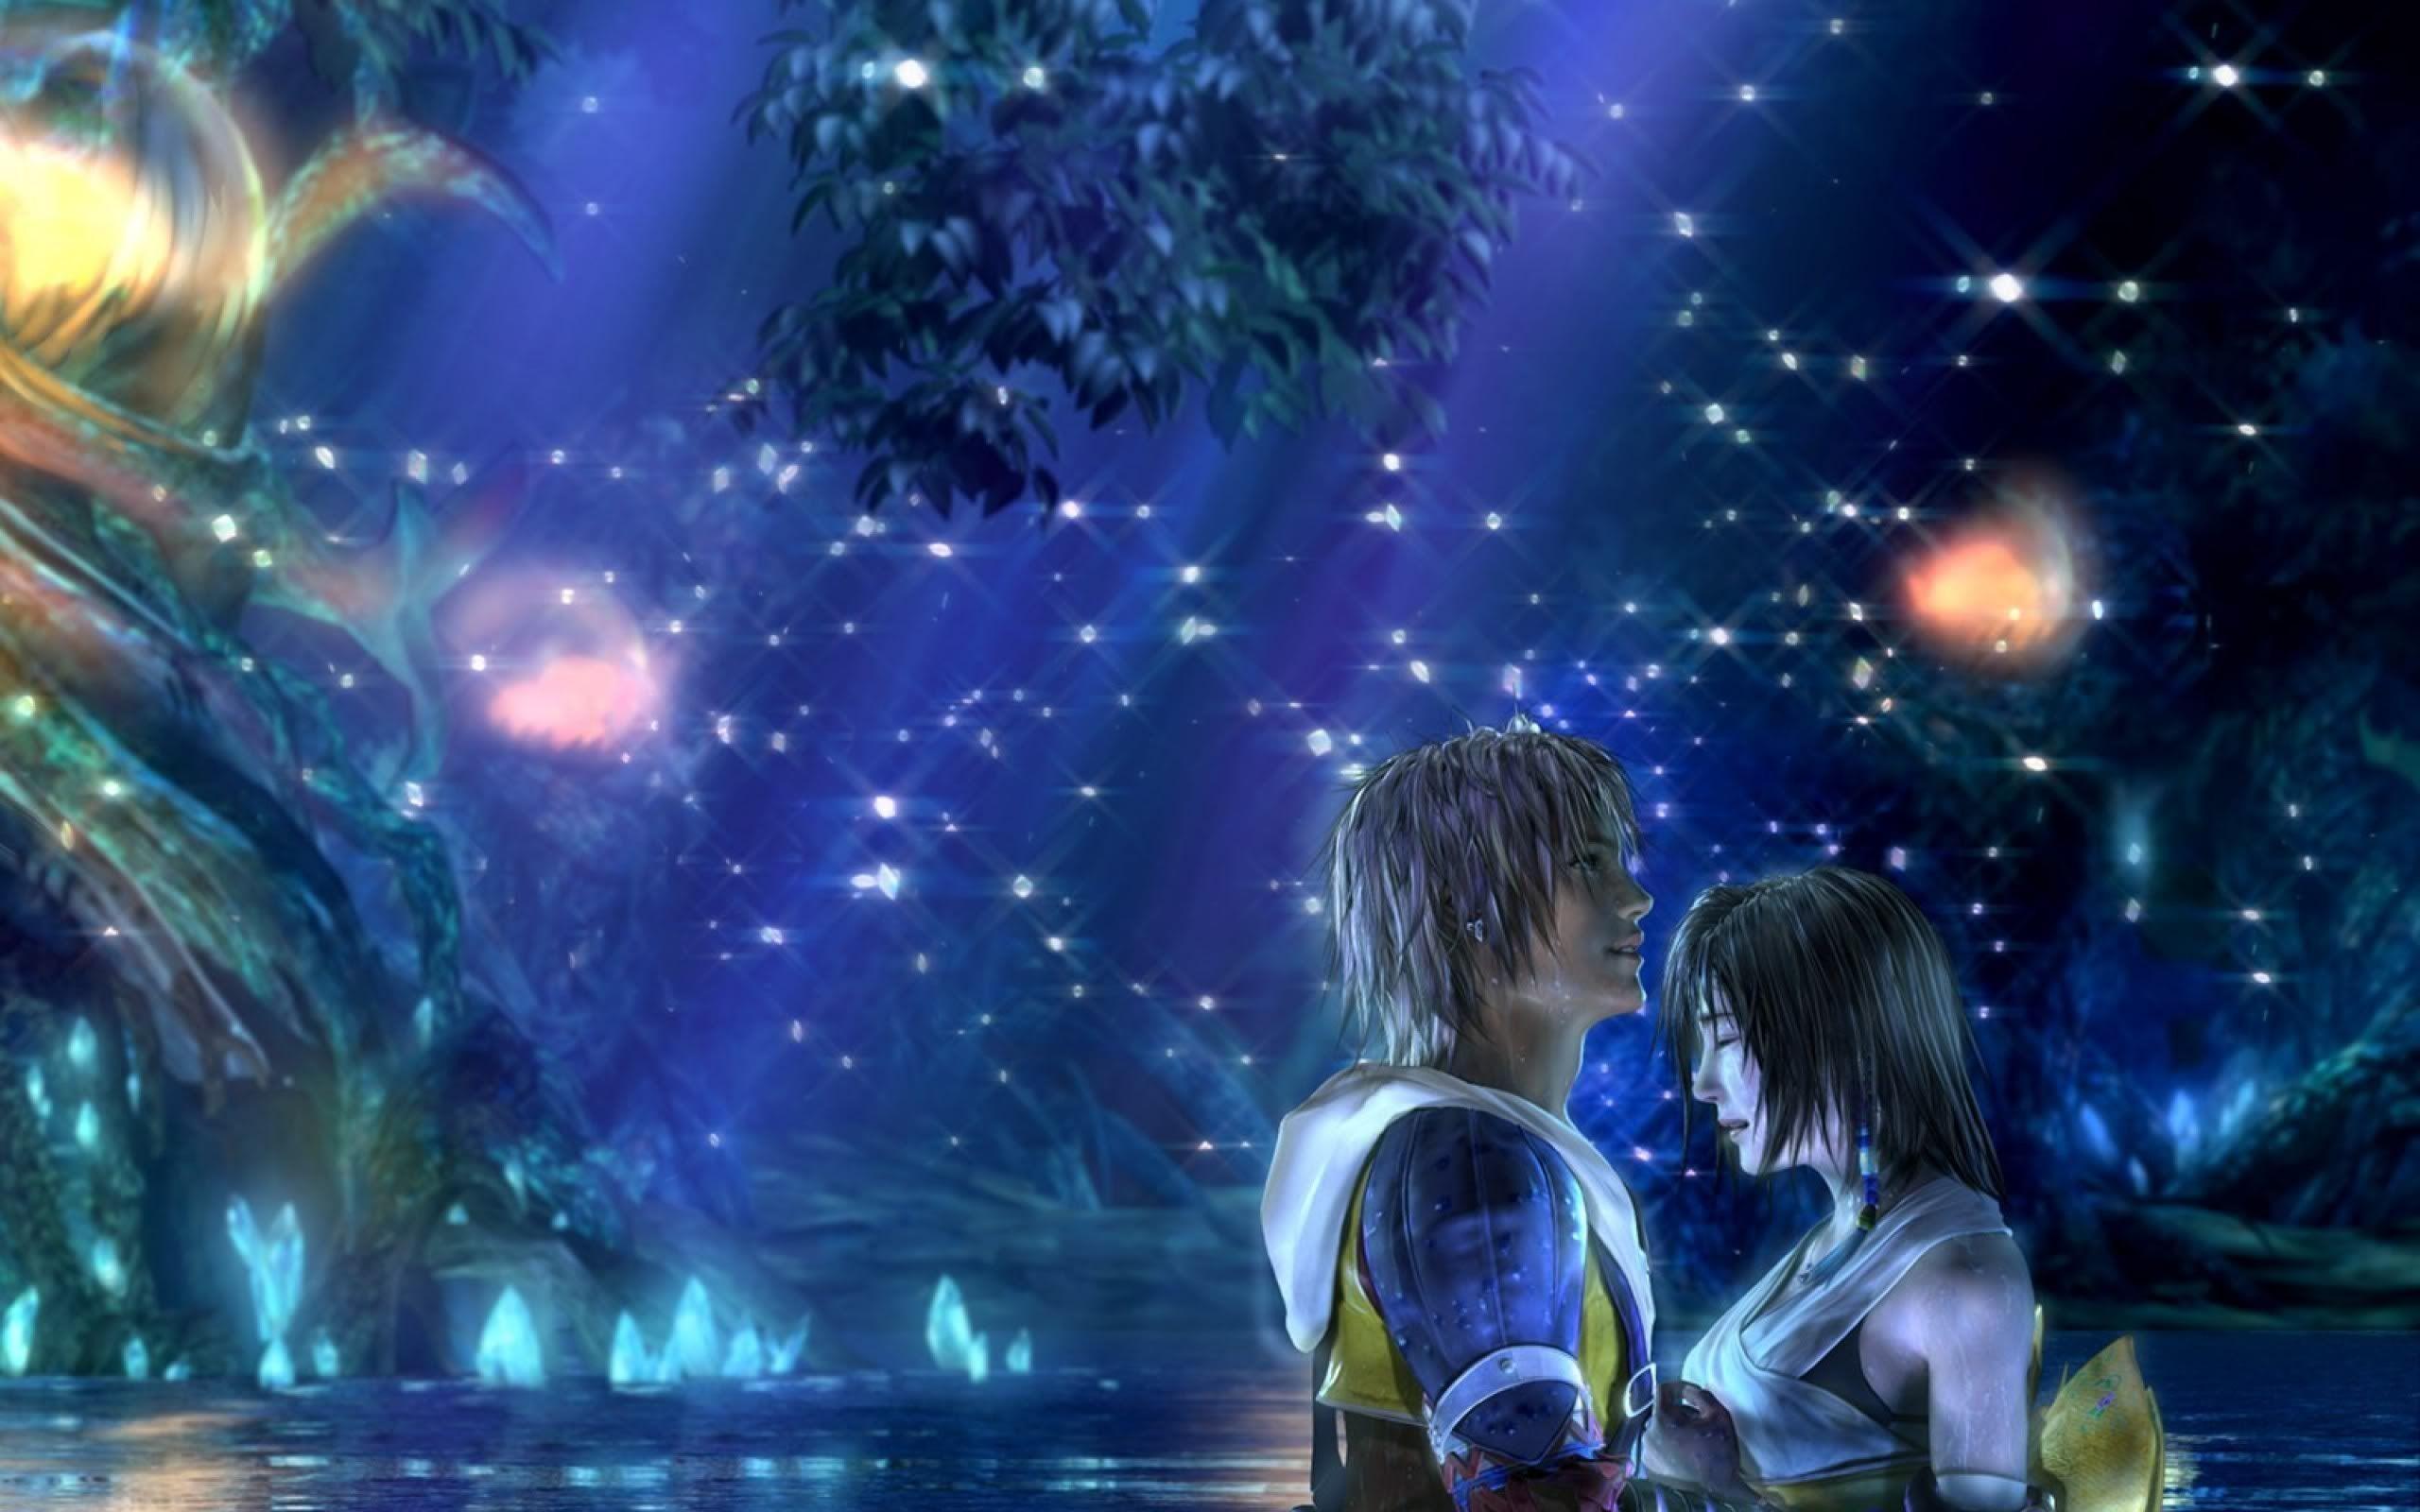 2560x1600 Final Fantasy X Wallpapers - Full HD wallpaper search